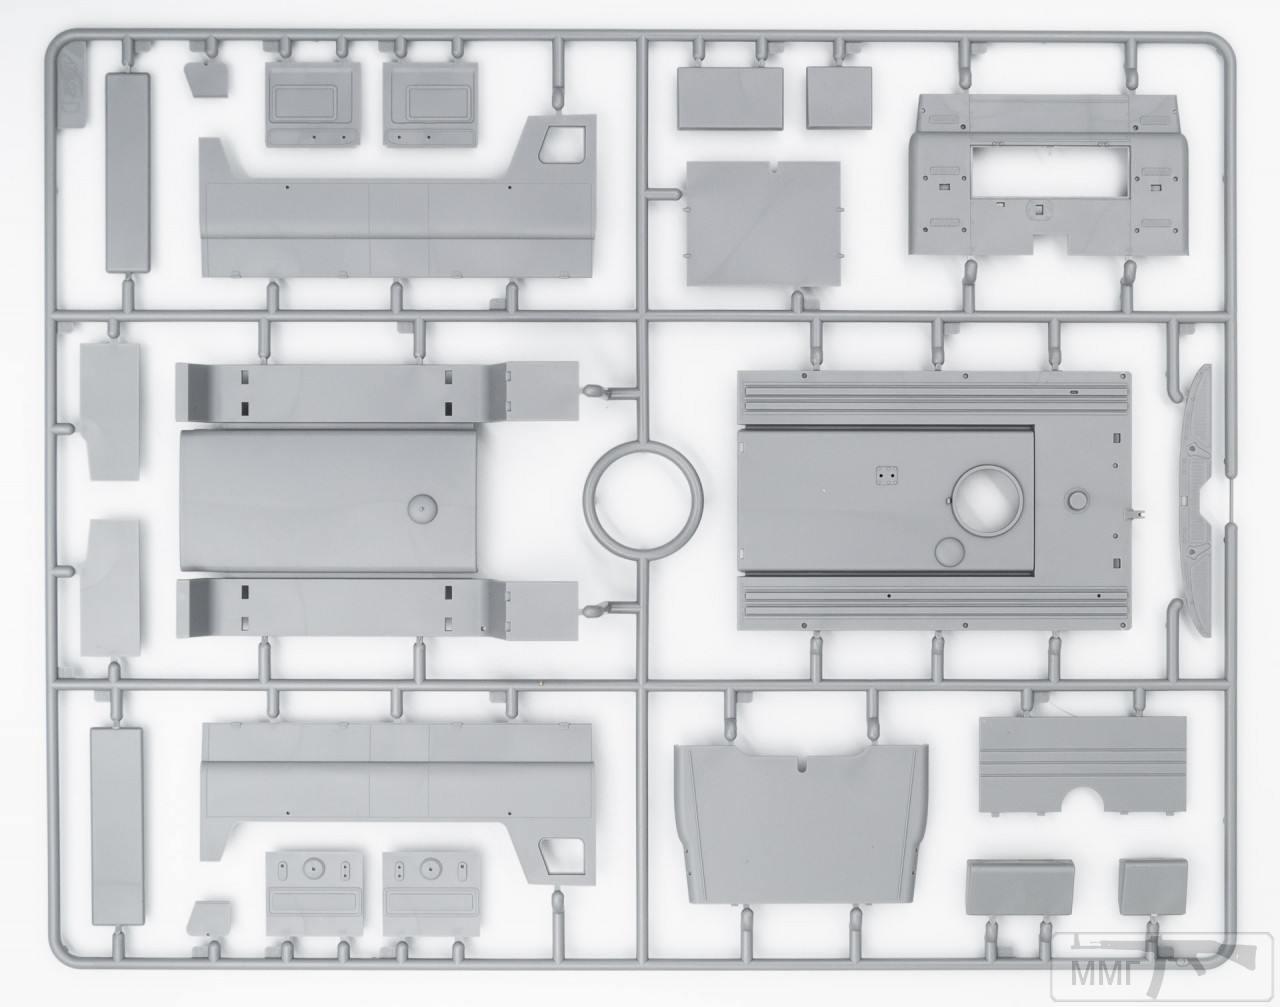 99848 - Обзор моделей и афтемаркета.